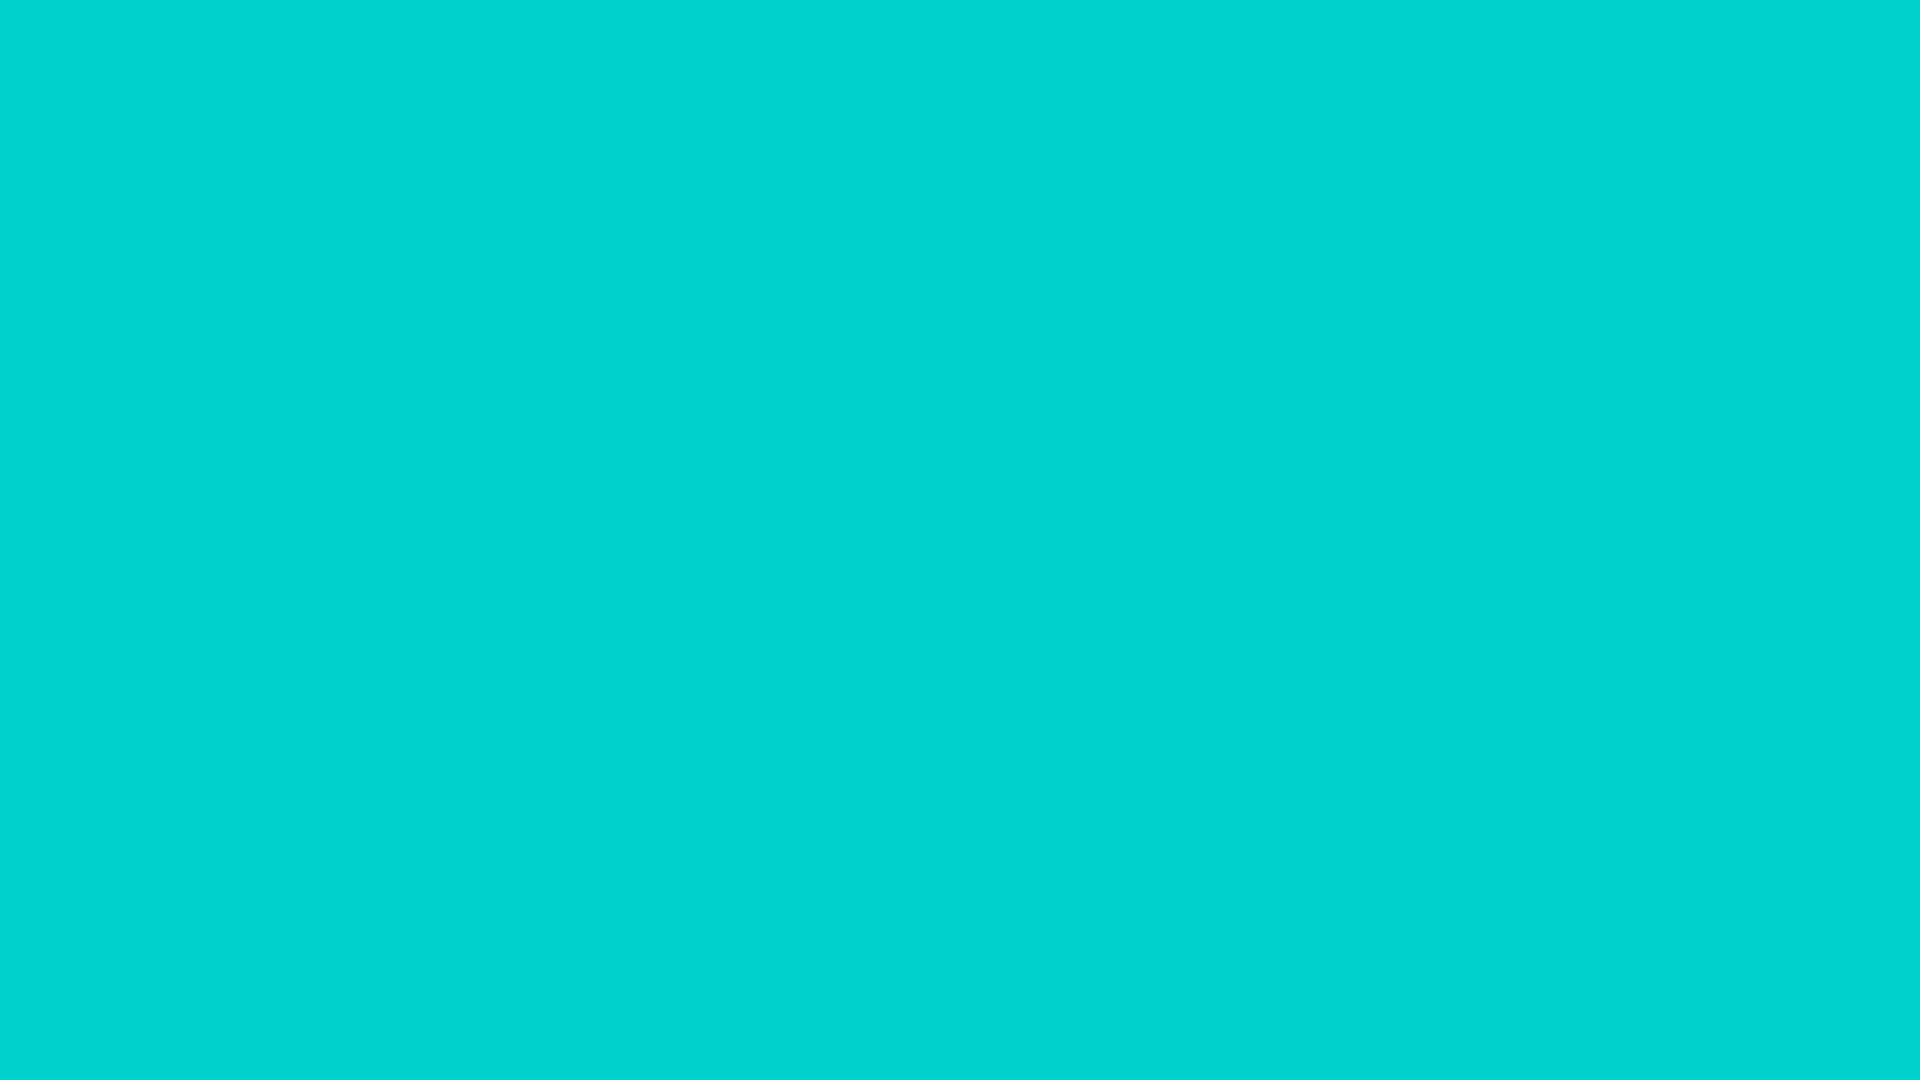 «Цвет яиц дрозда» — #00cccc